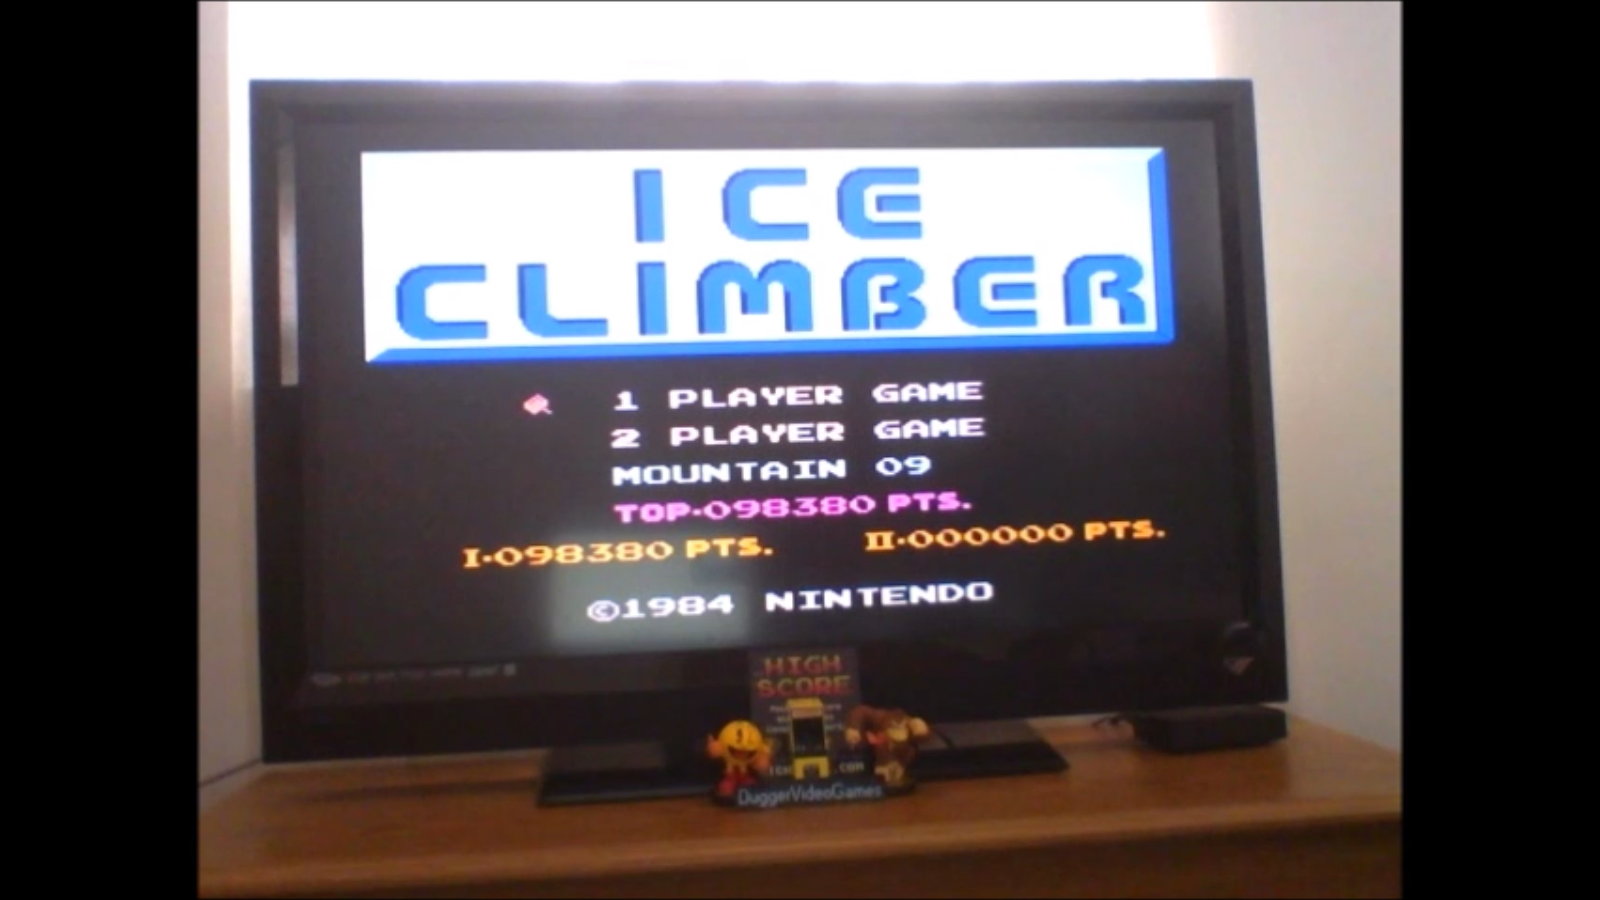 DuggerVideoGames: Ice Climber (NES/Famicom Emulated) 98,380 points on 2017-03-06 19:36:31